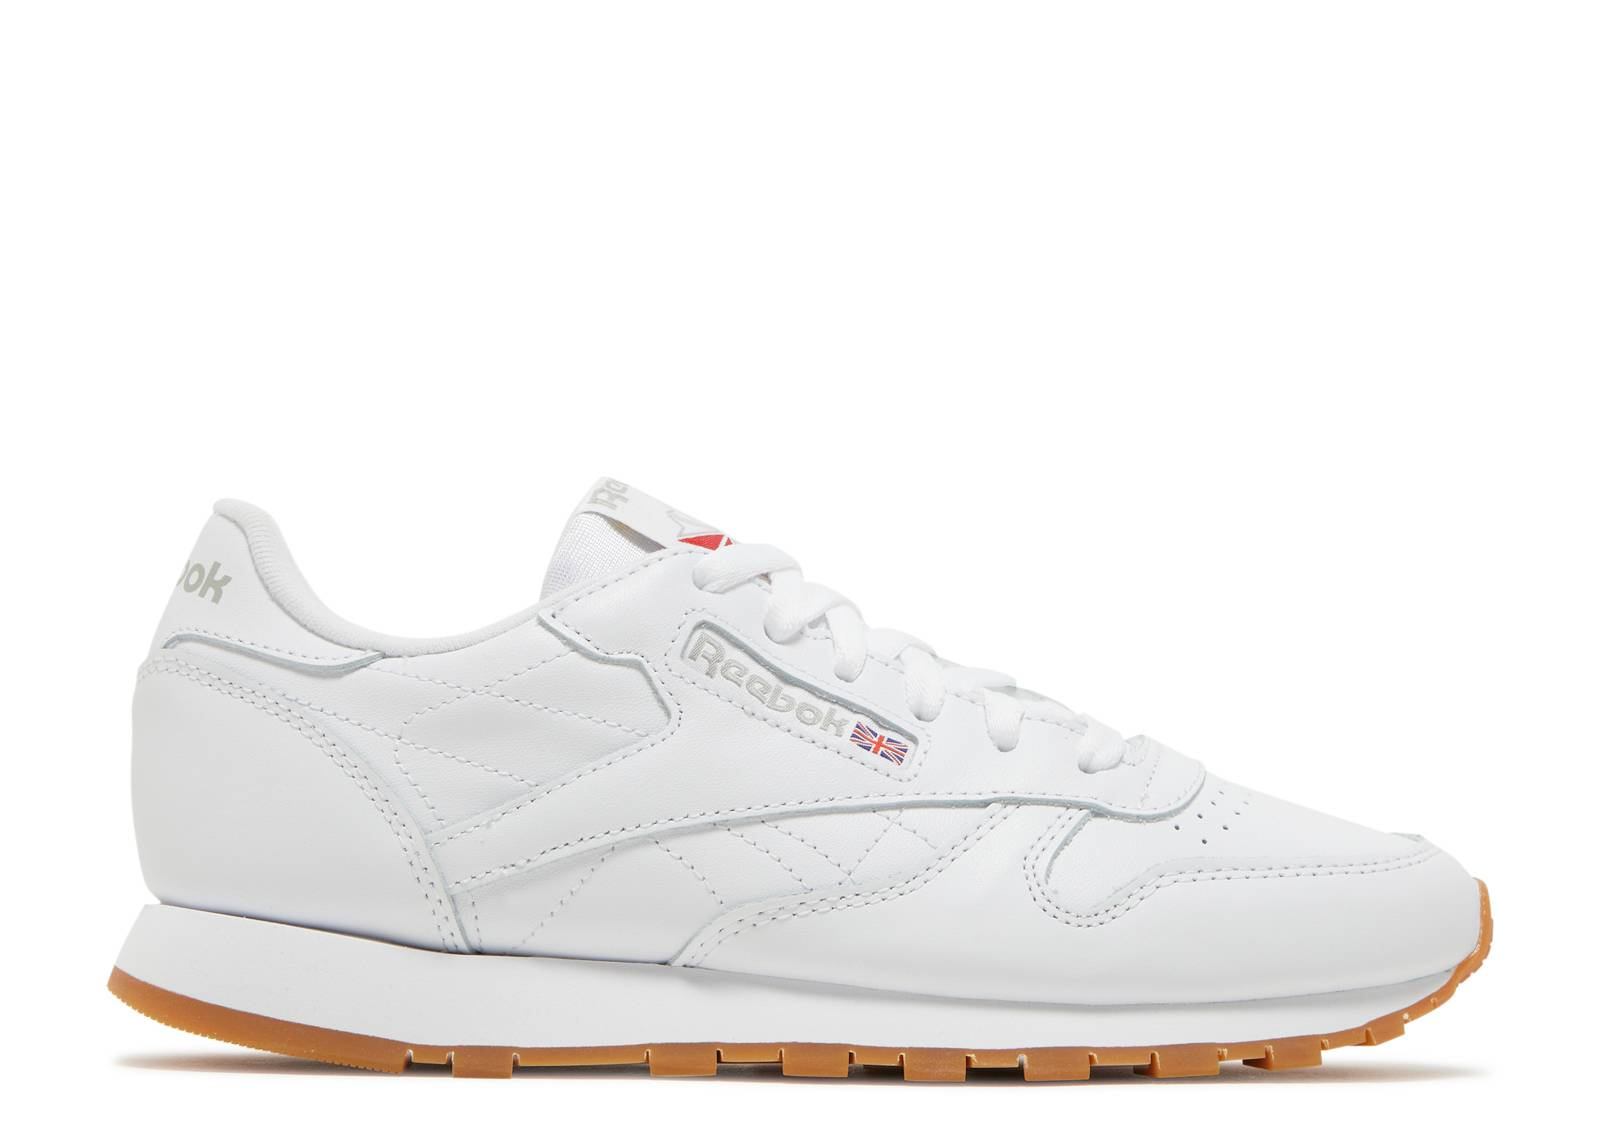 2f509efb6a6645 Cl Lthr - Reebok - 49801 - white gum